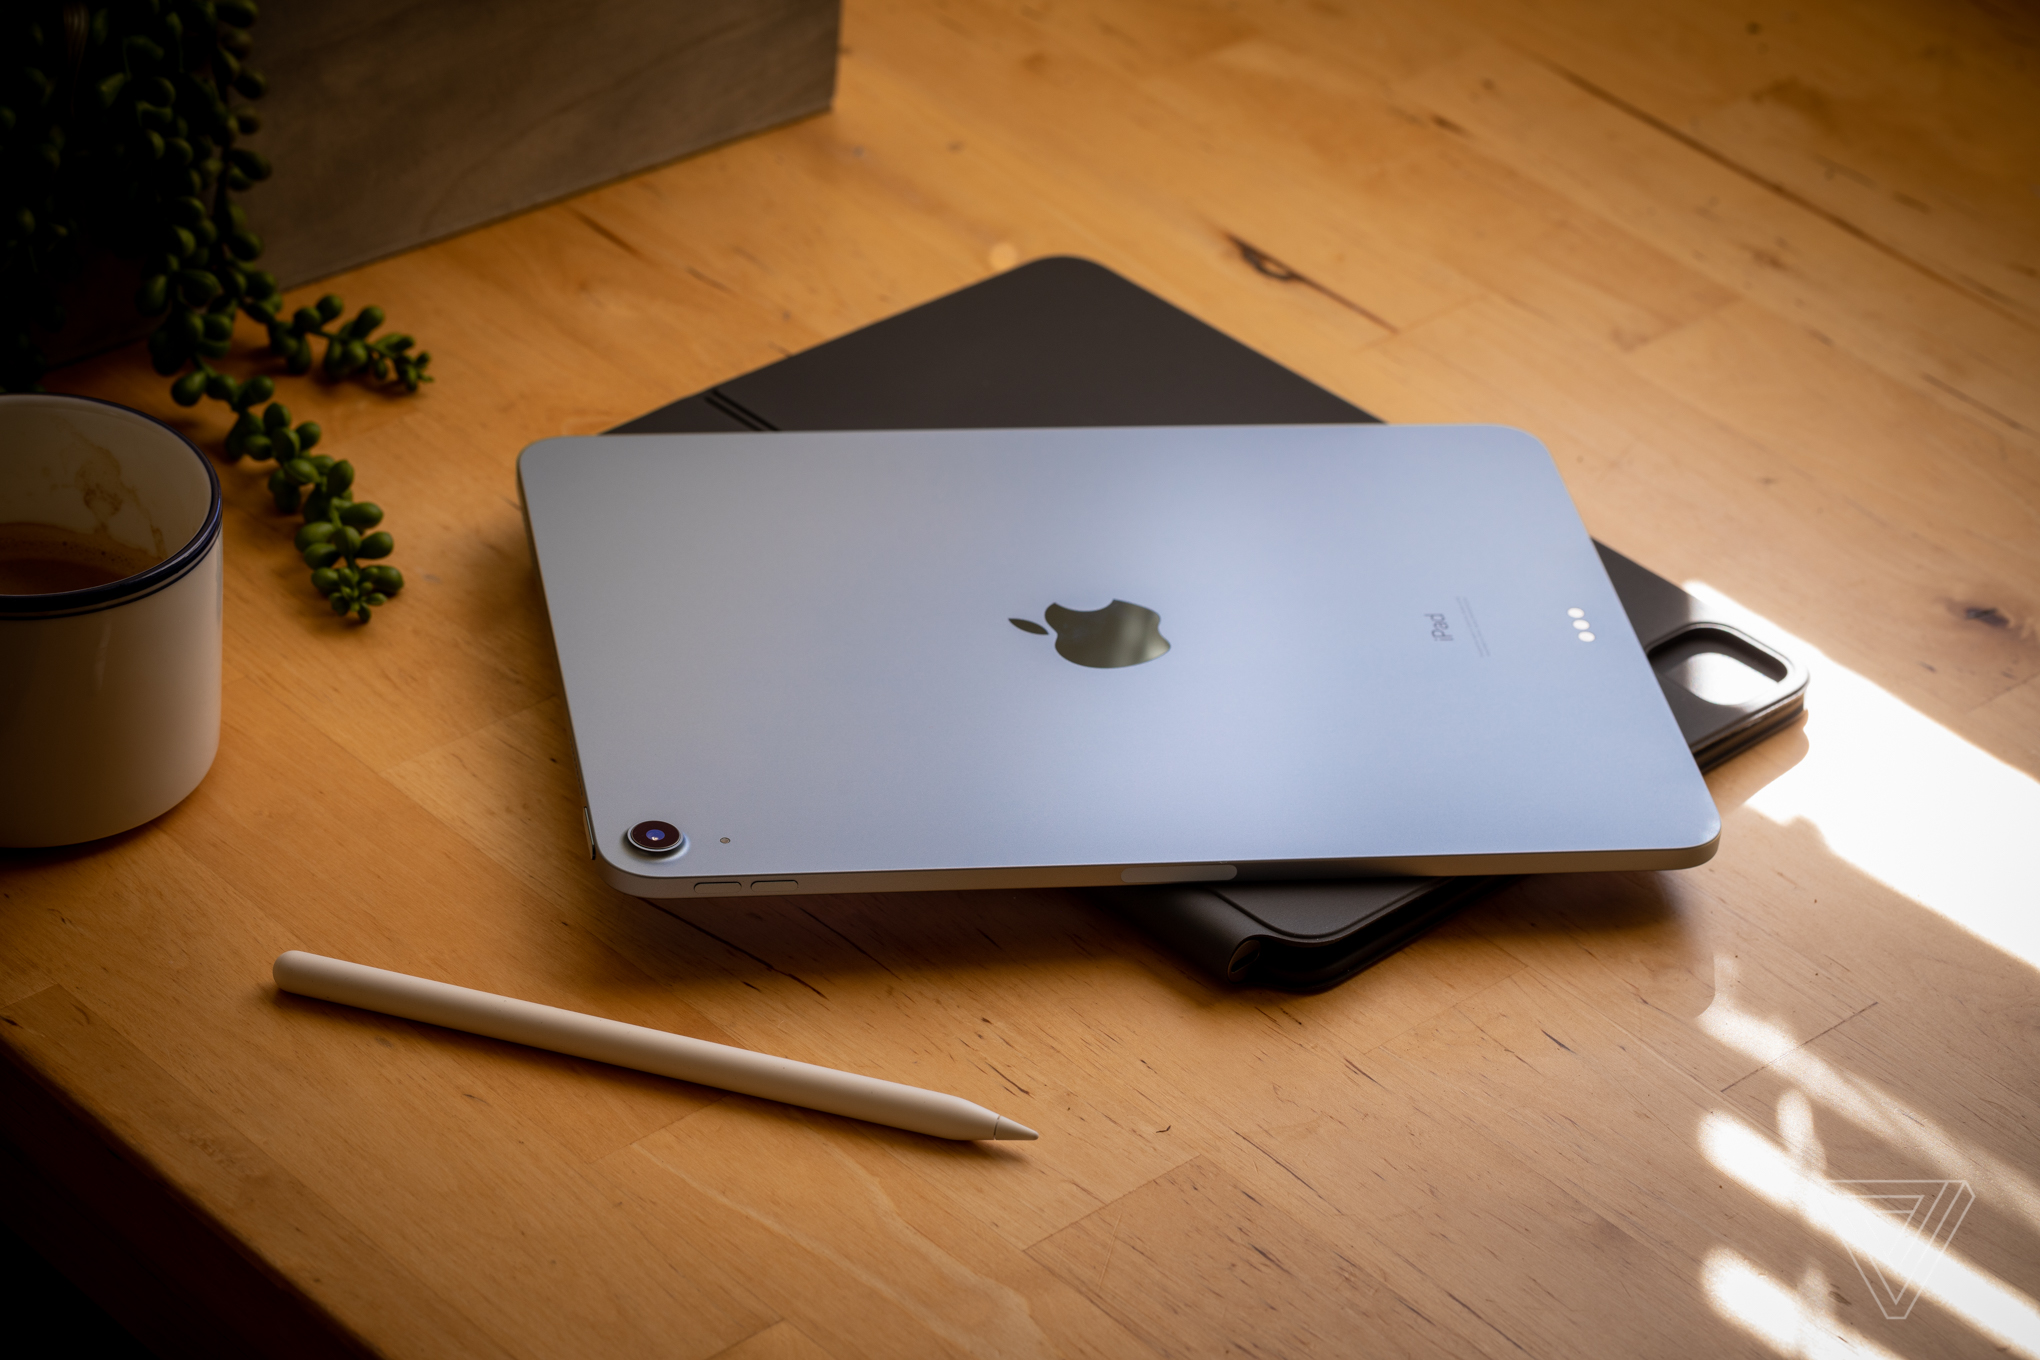 The 2020 iPad Air and new iPad Mini have the same design and shape as the iPad Pro